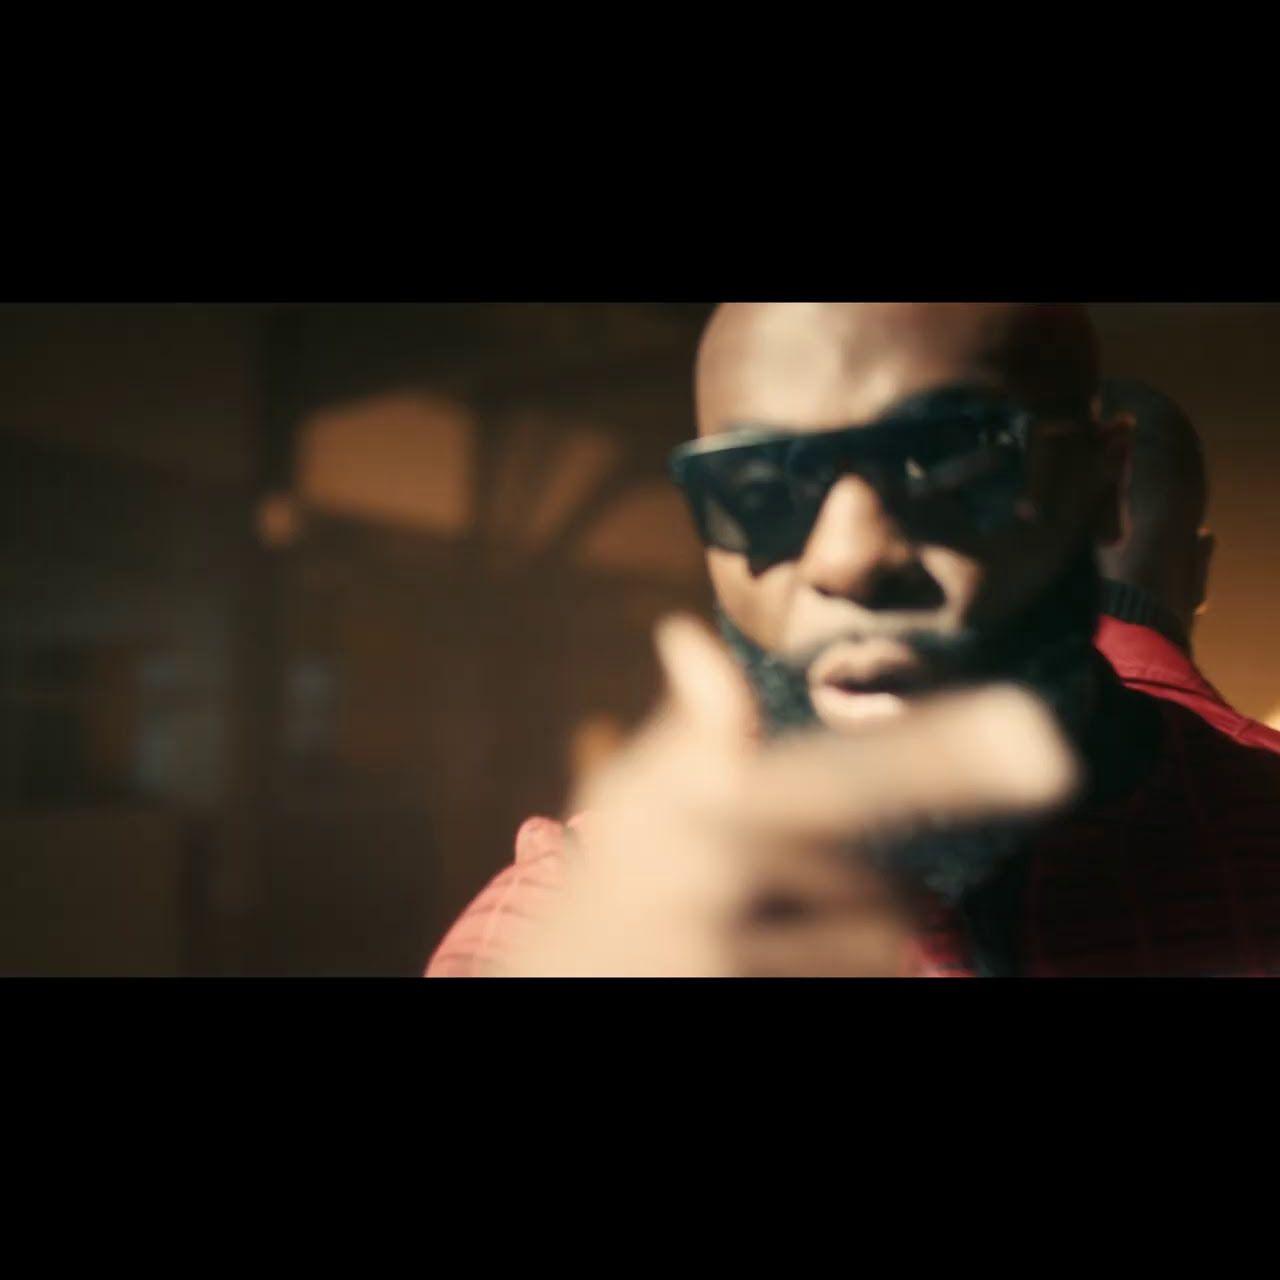 Kaaris - Deux deux (ft. Bosh) (Thumbnail)